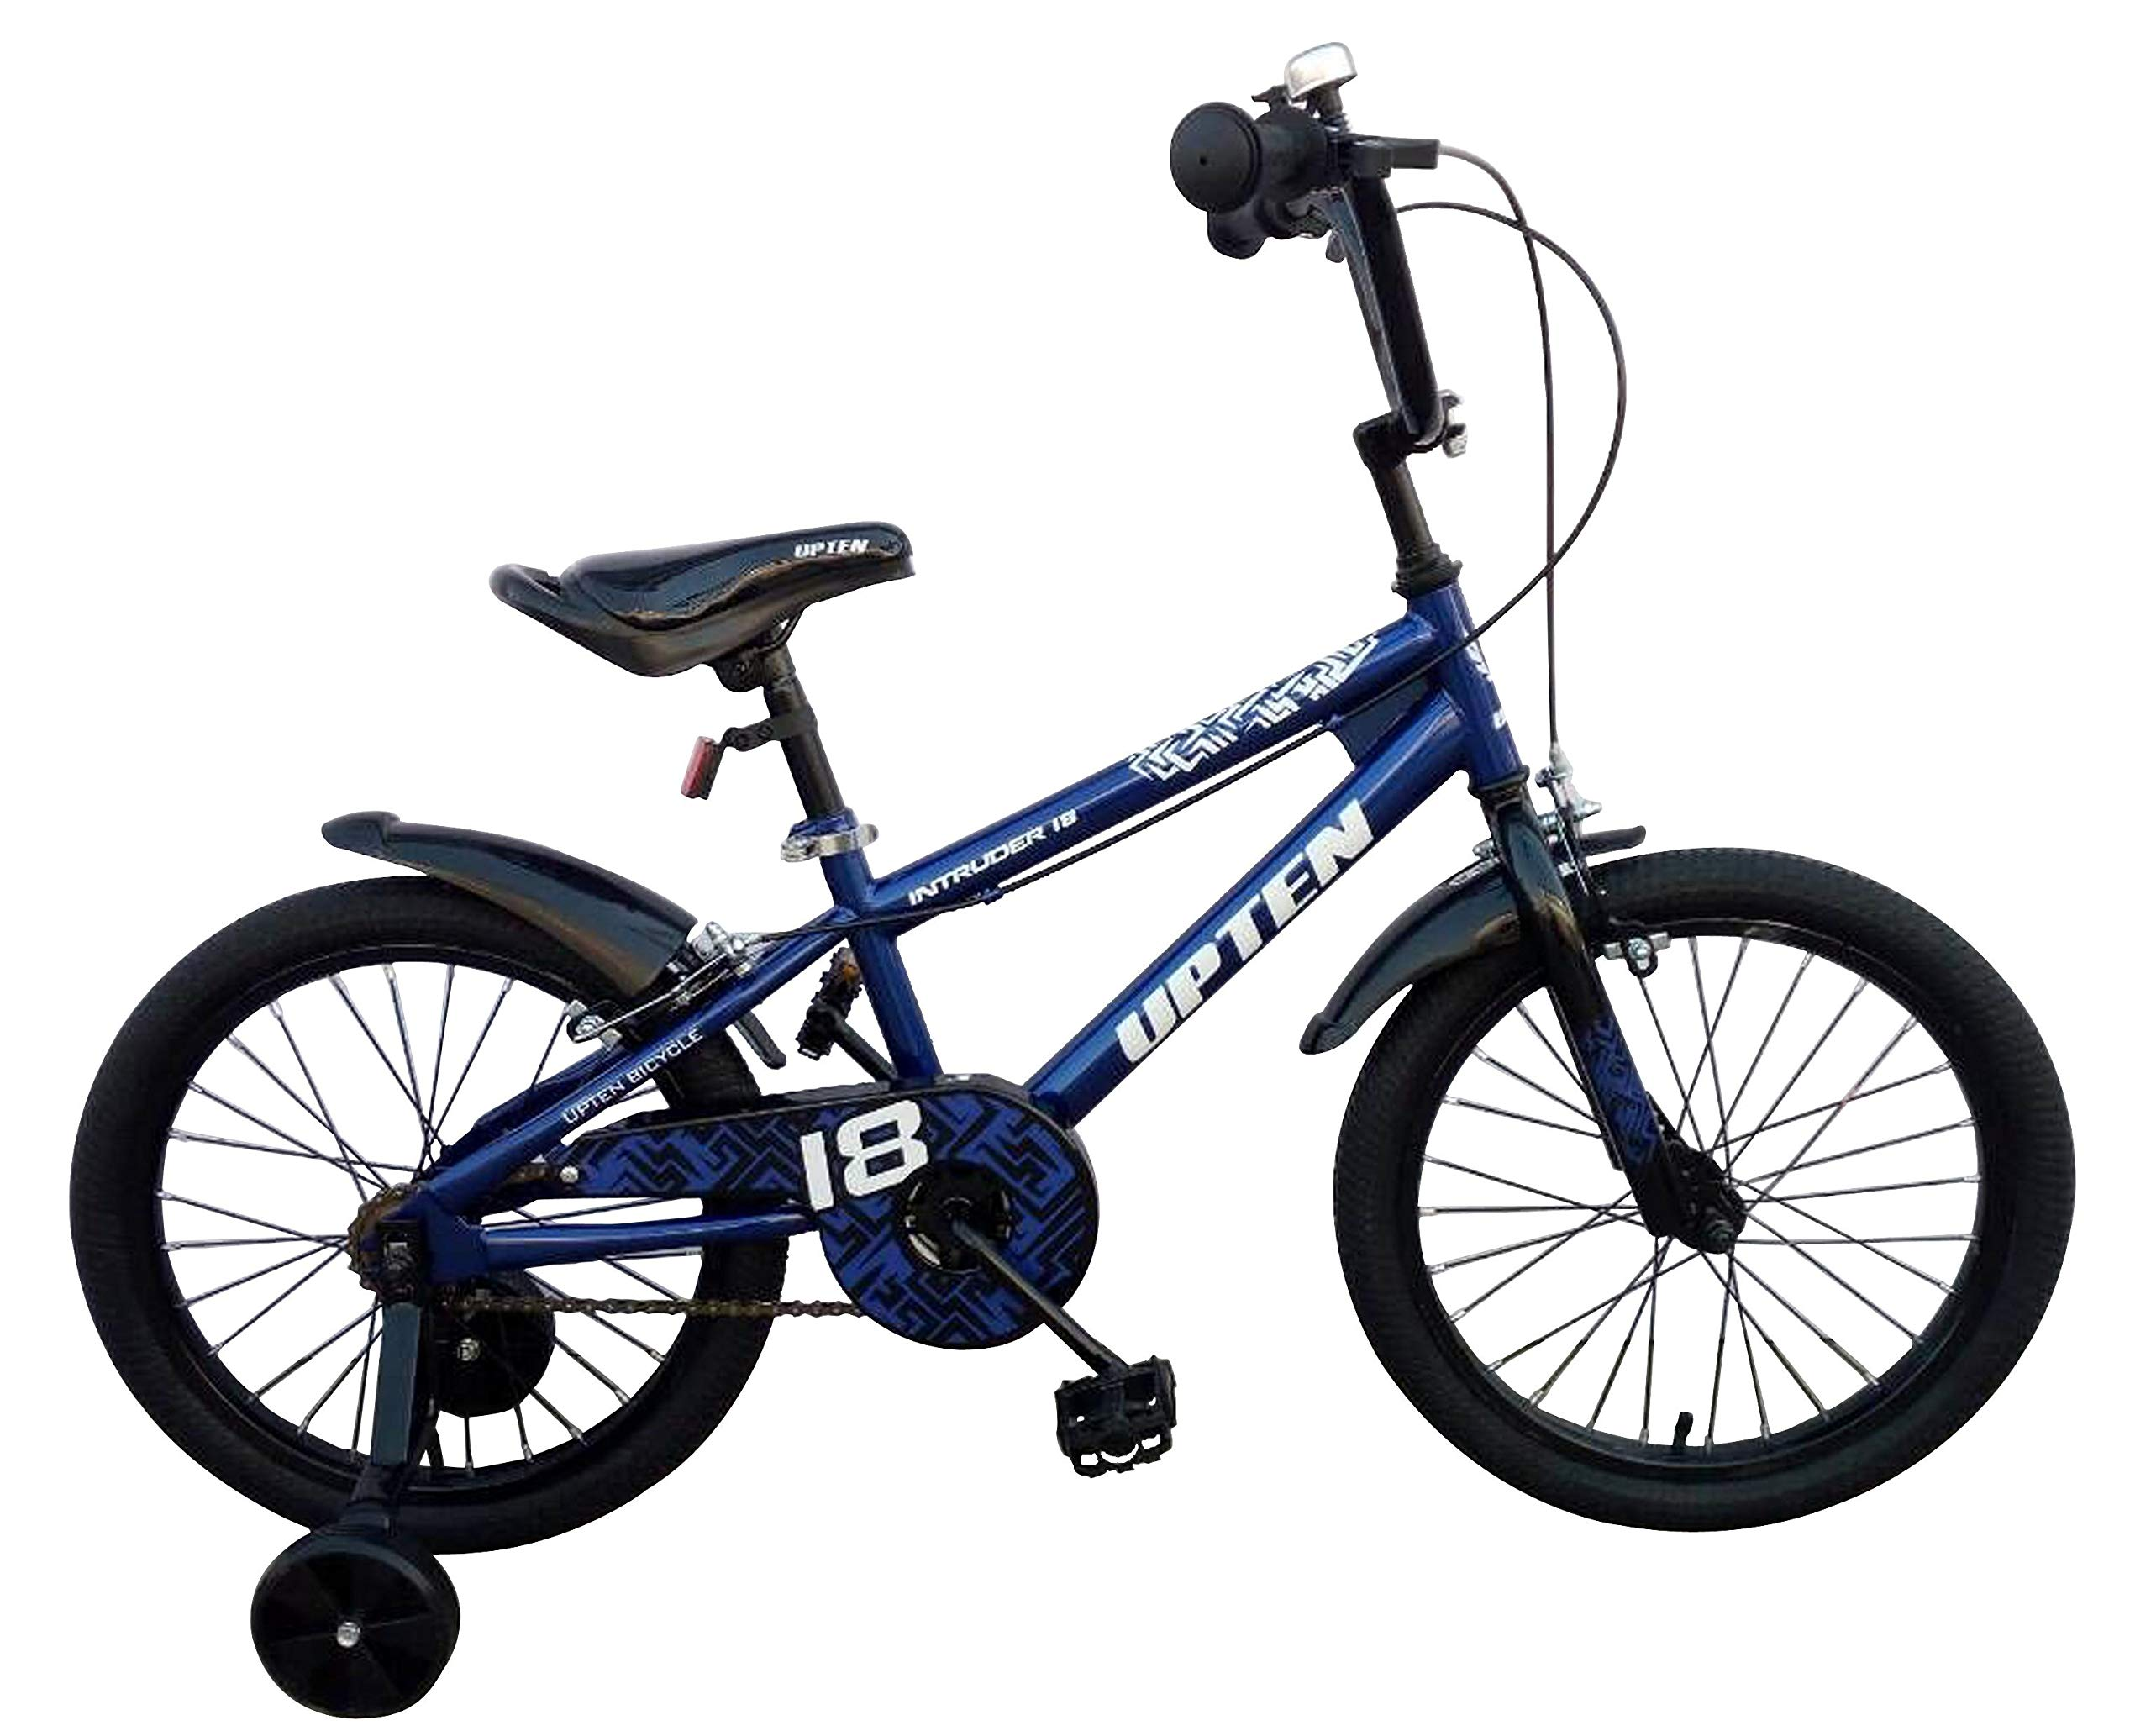 9ecd193e6e0 Upten Intruder kids bike children bicycle cycle Price in UAE ...